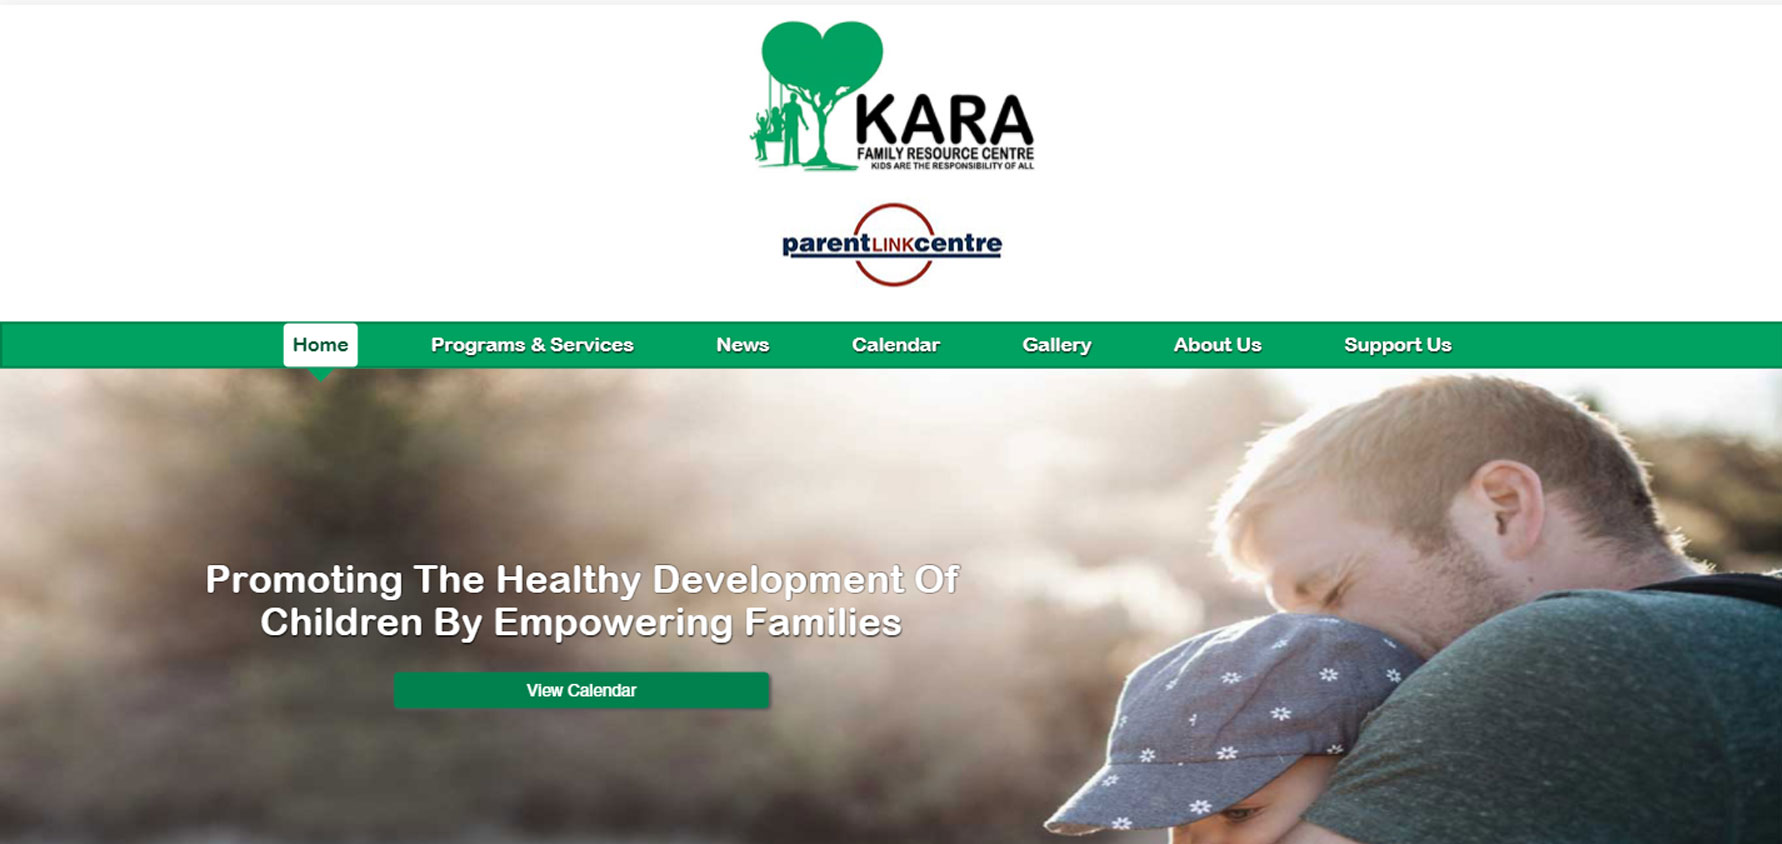 KARA Family Resource Center